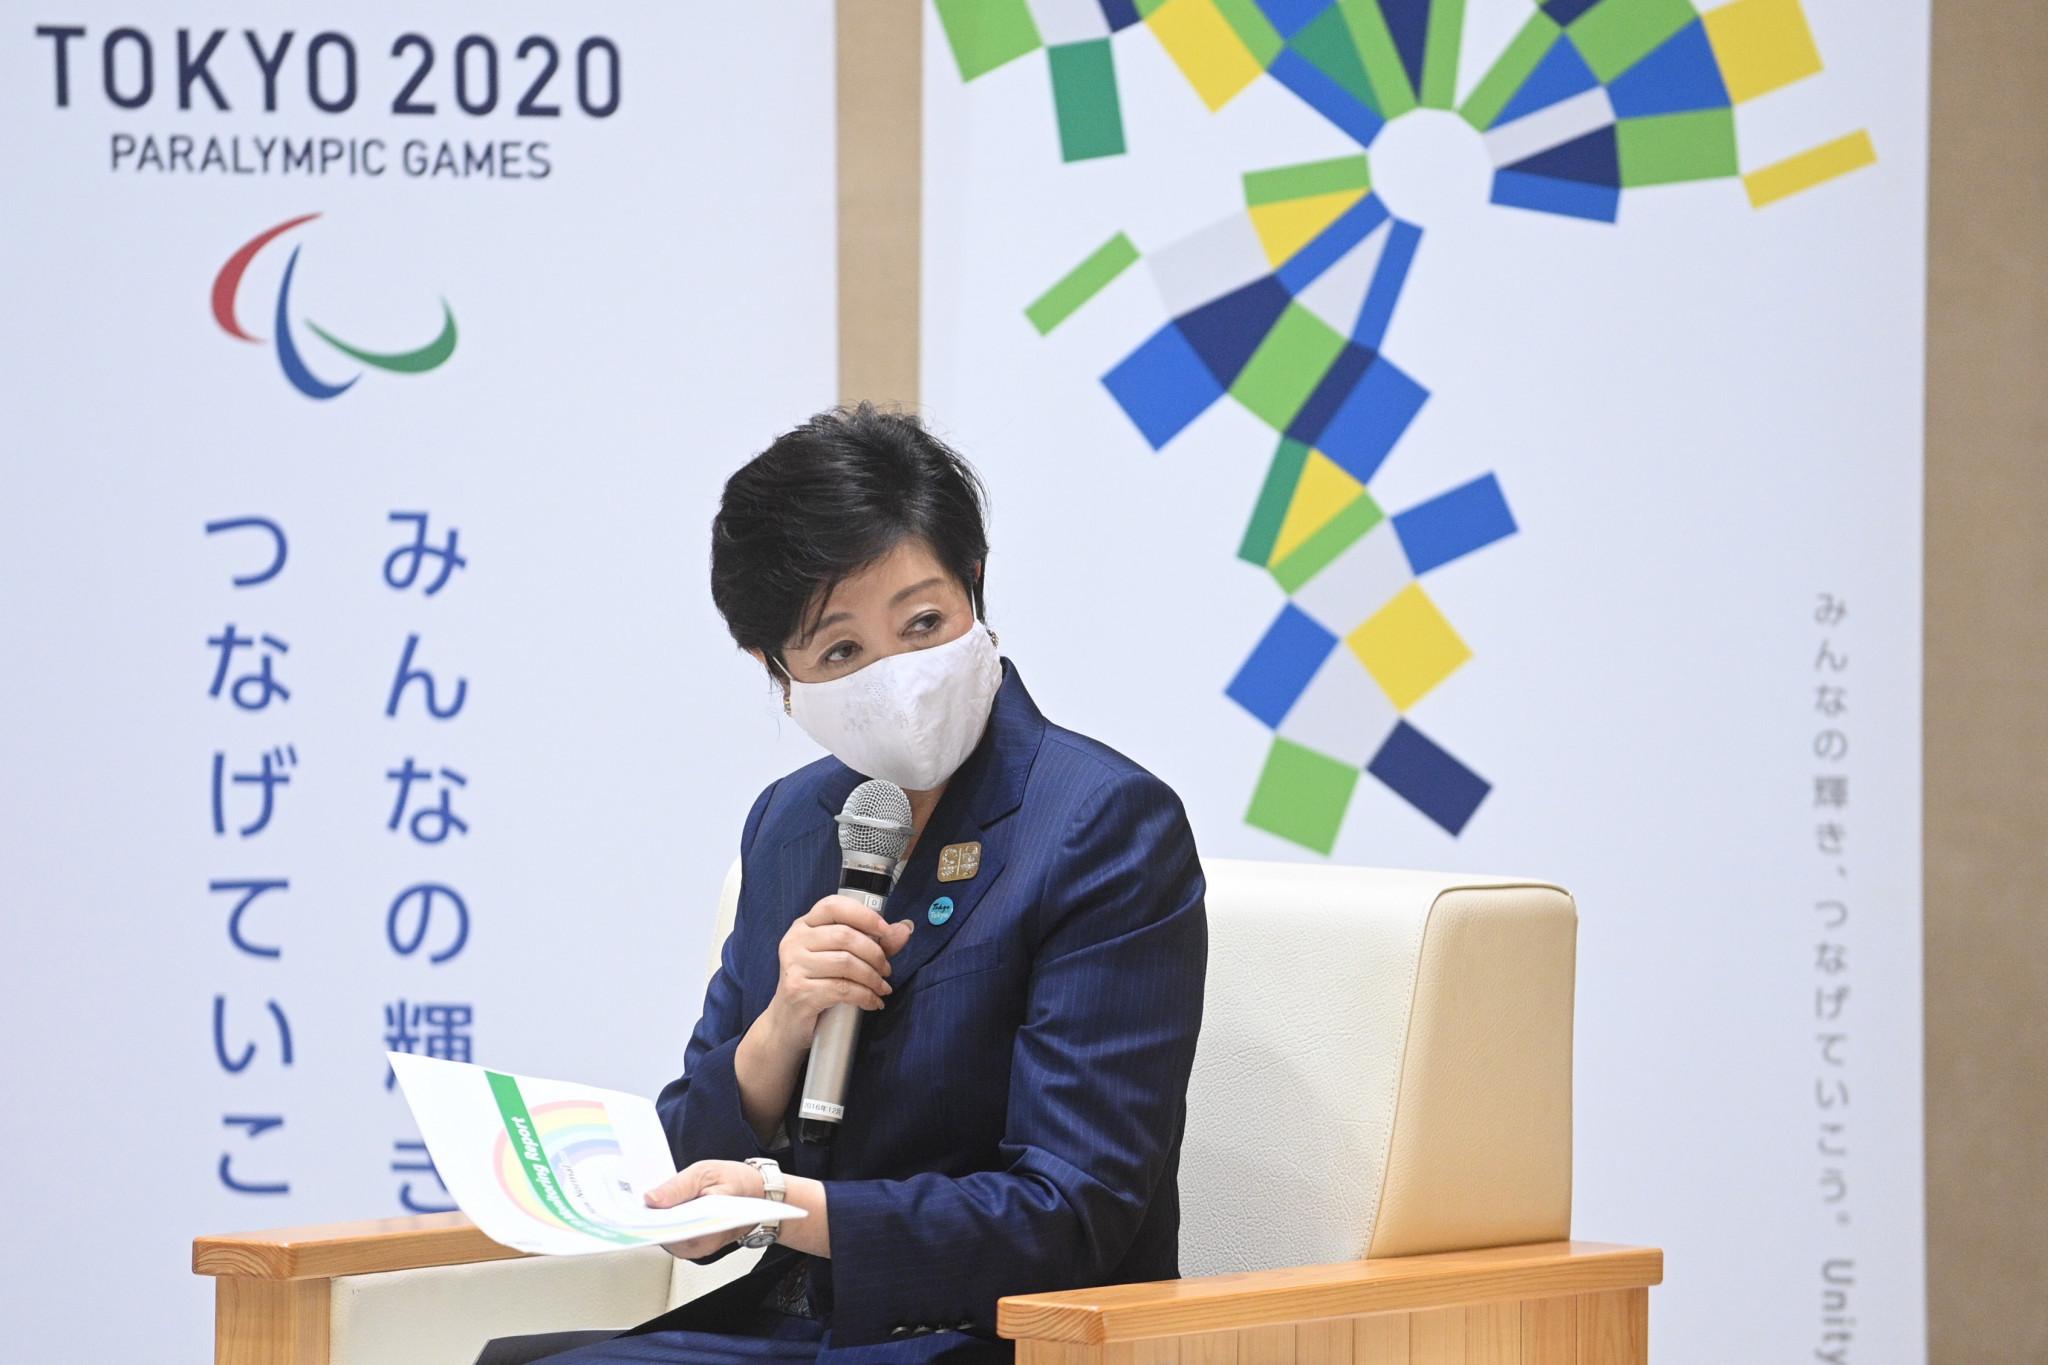 Tokyo Governor Koike to attend grand opening of Aquatics Centre